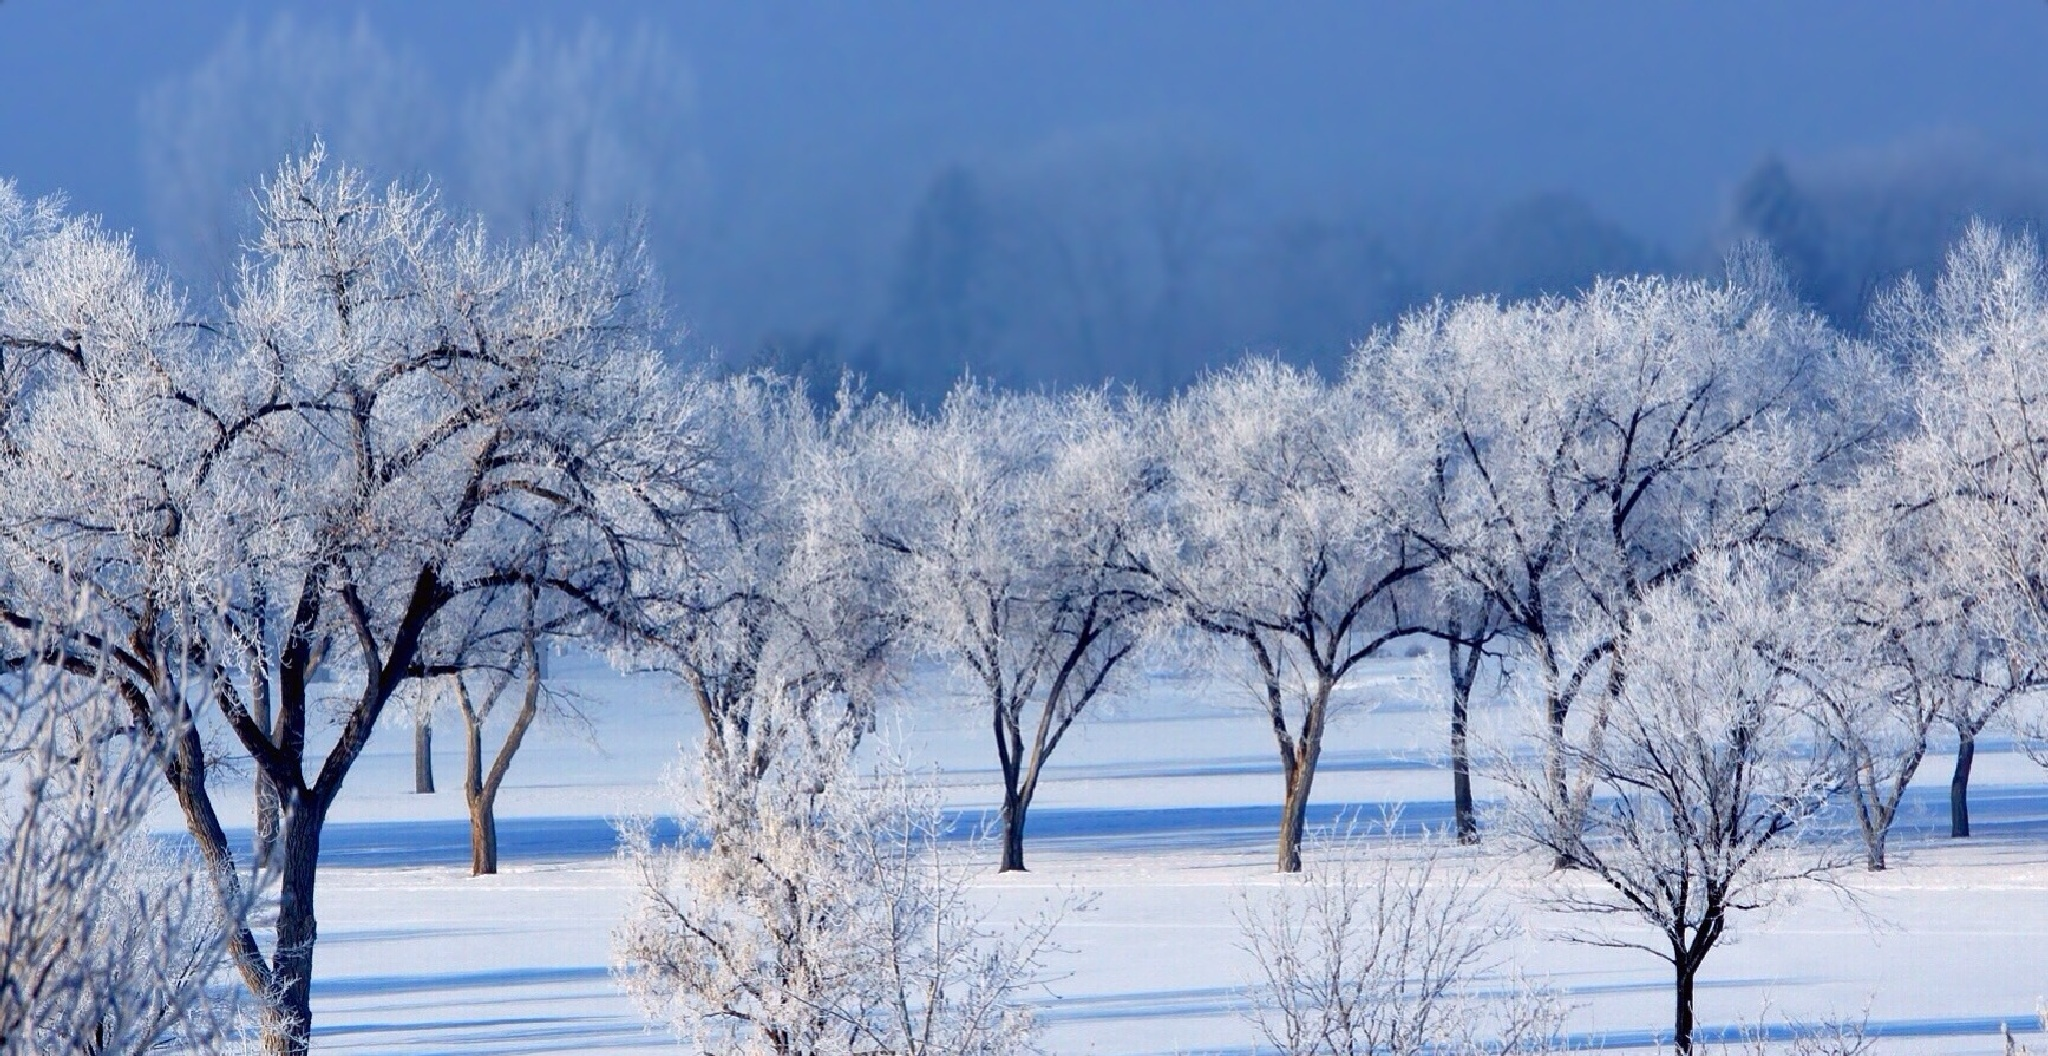 Winter's Blu by Bary_B